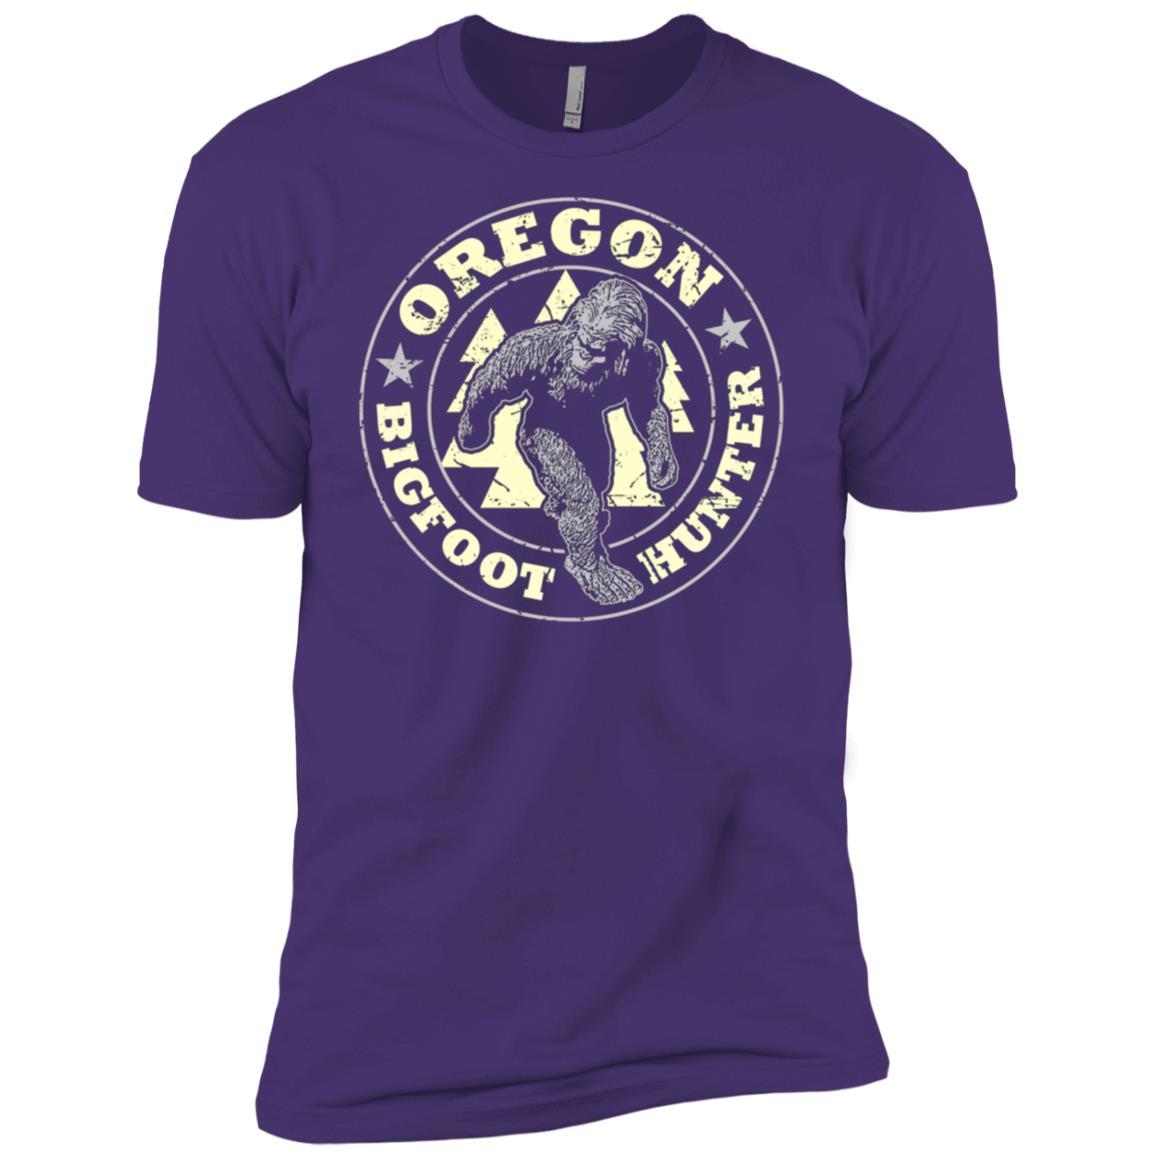 Oregon Bigfoot Hunter Believe Men Short Sleeve T-Shirt